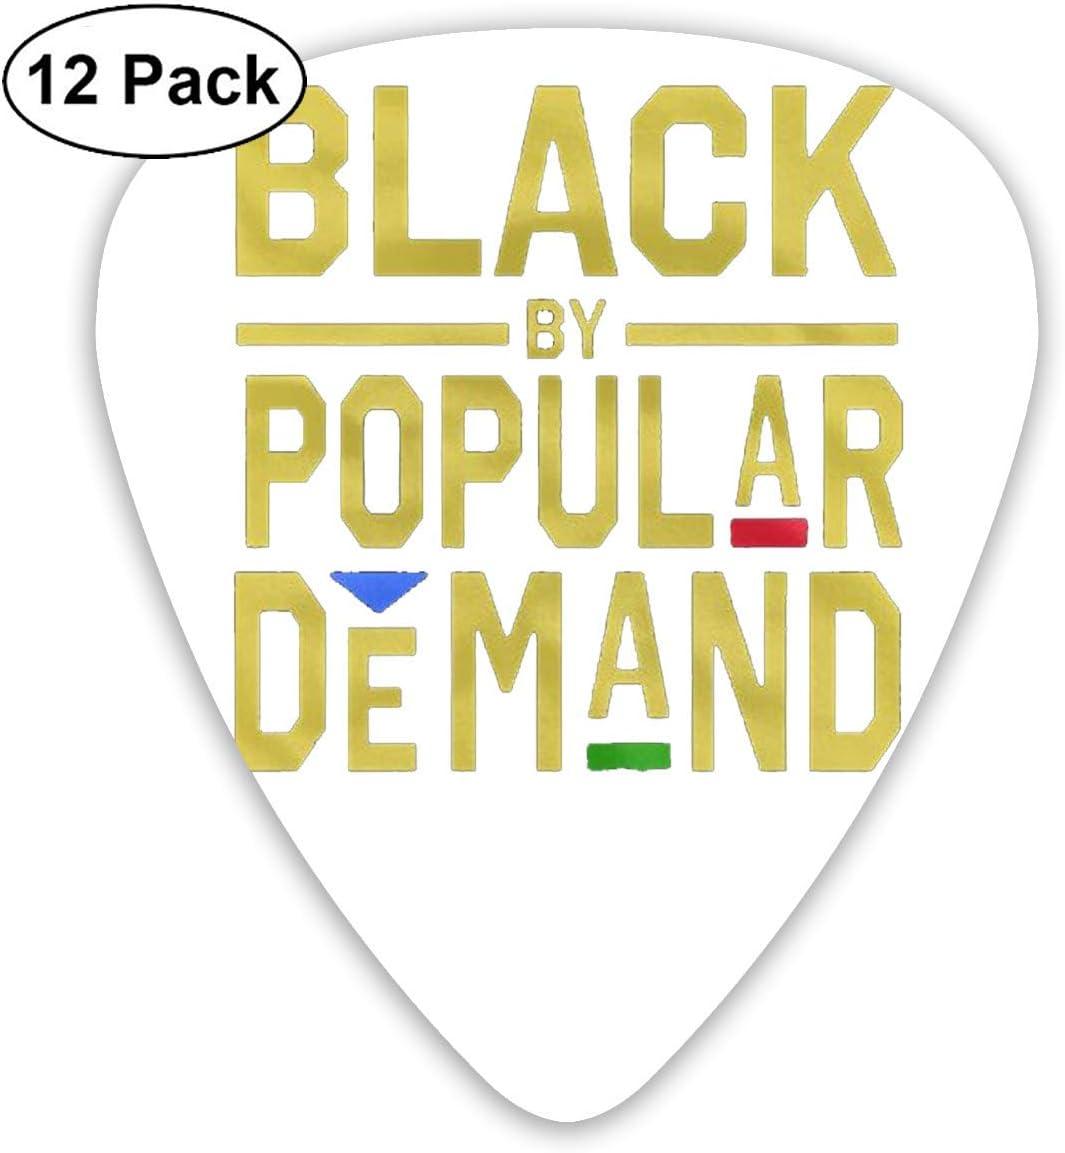 12 Pack Guitar Picks Black Popular.png Think, Medium and Heavy ...